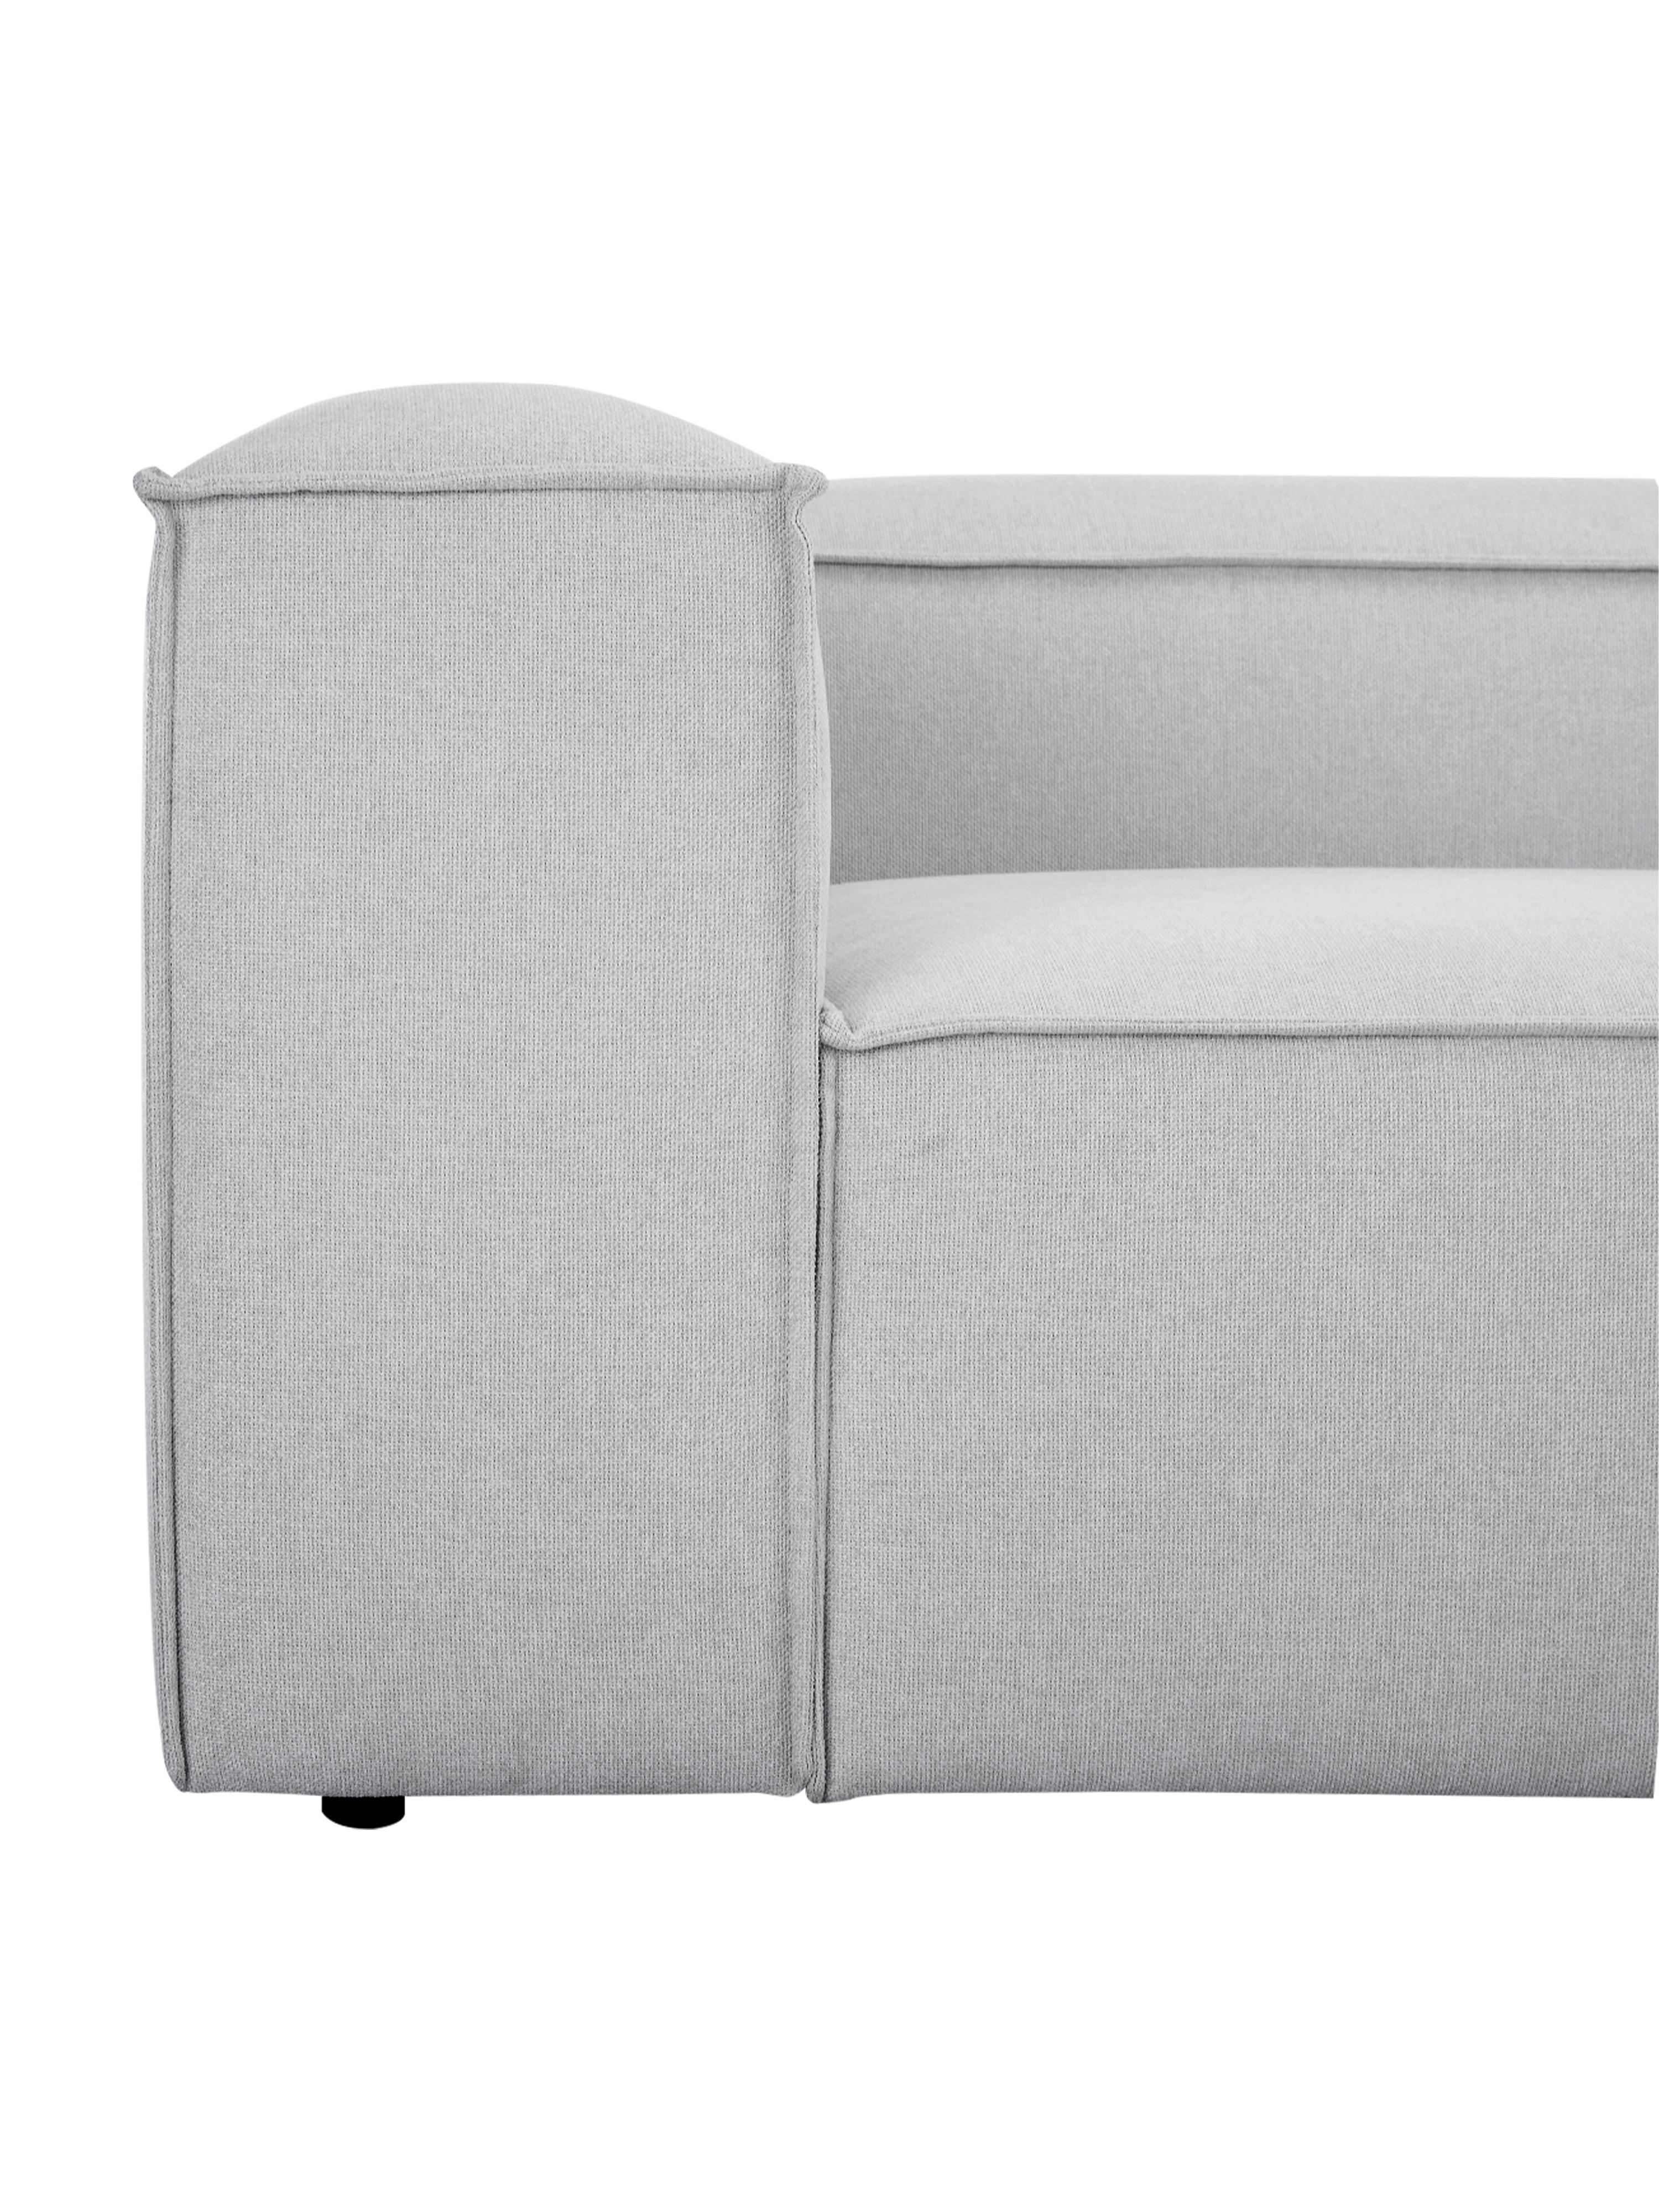 Modulares Sofa Lennon (4-Sitzer), Bezug: Polyester 35.000 Scheuert, Gestell: Massives Kiefernholz, Spe, Füße: Kunststoff, Webstoff Hellgrau, B 326 x T 119 cm